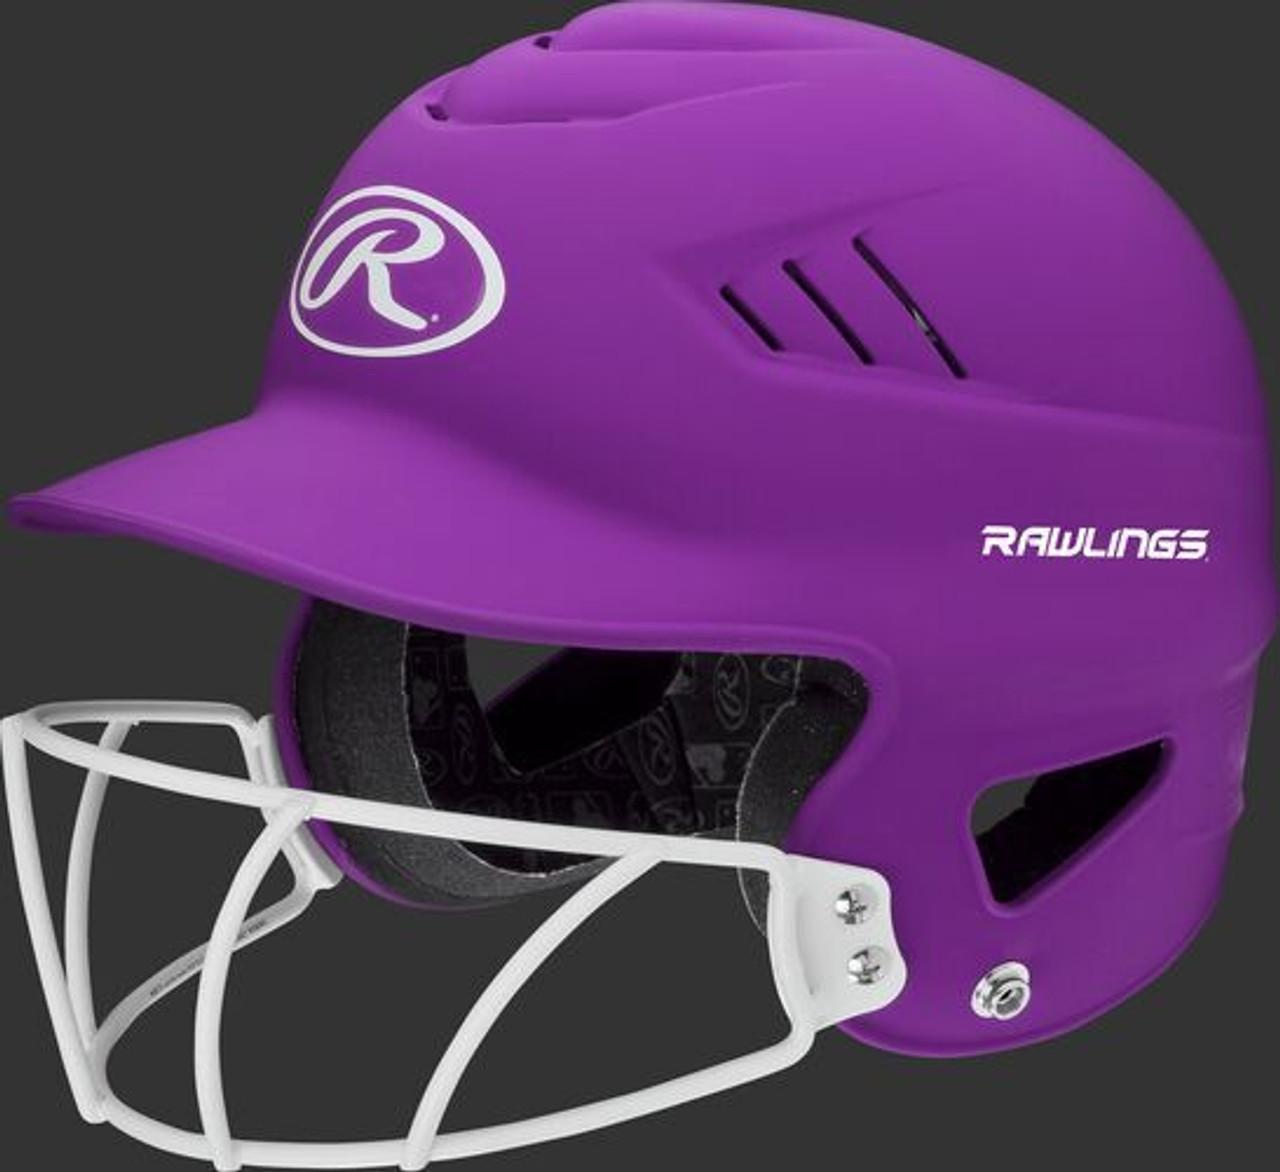 Fastpitch Batting Helmet's